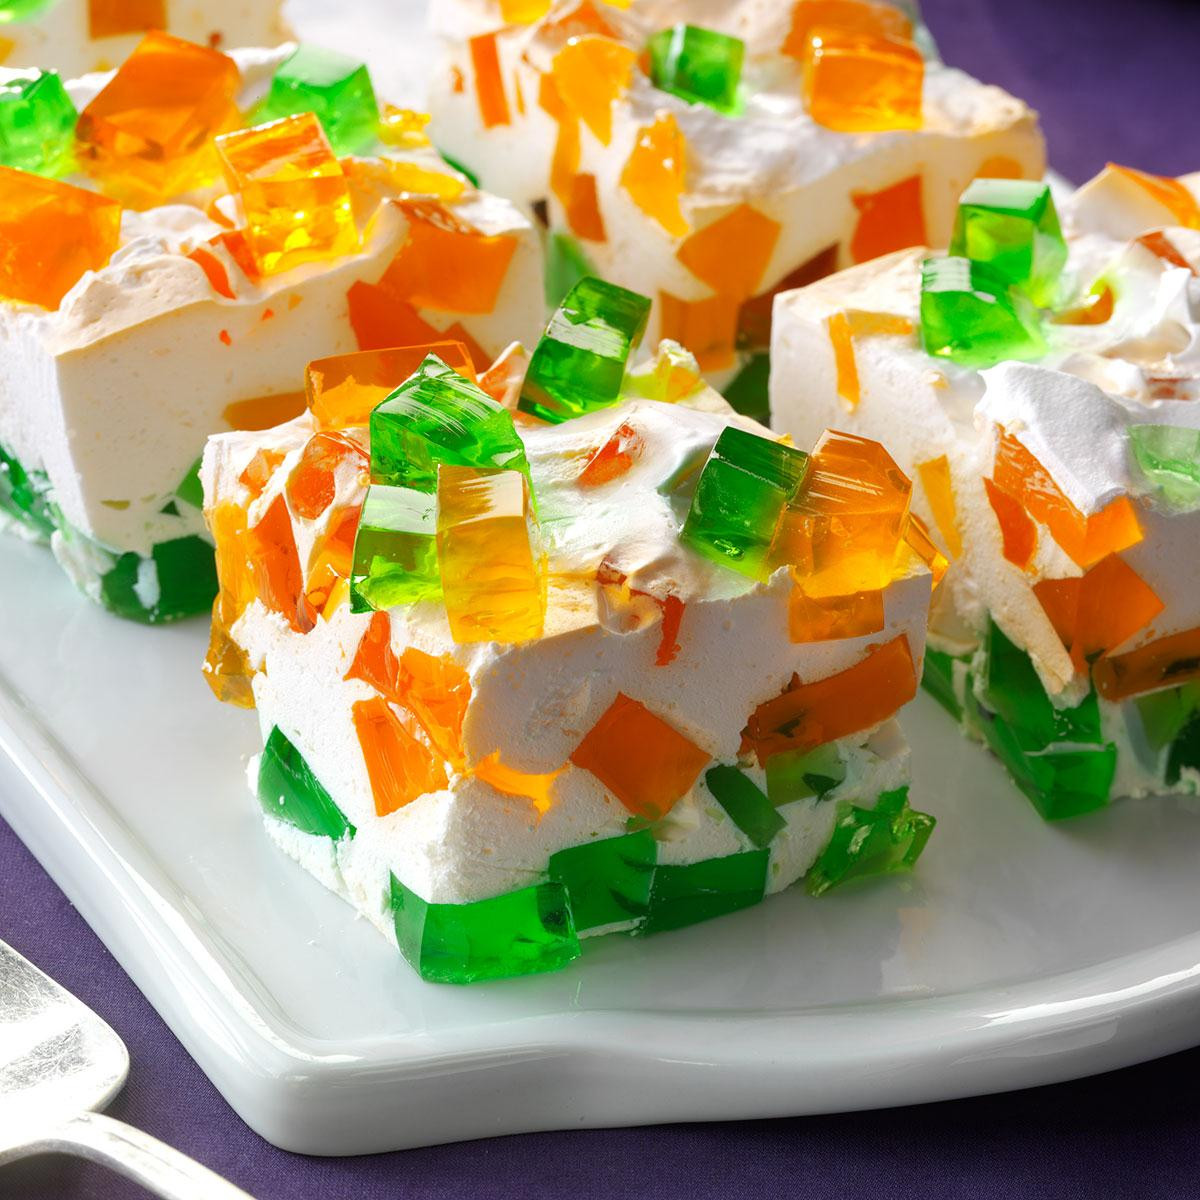 Jello Pudding Desserts  Stained Glass Gelatin Recipe